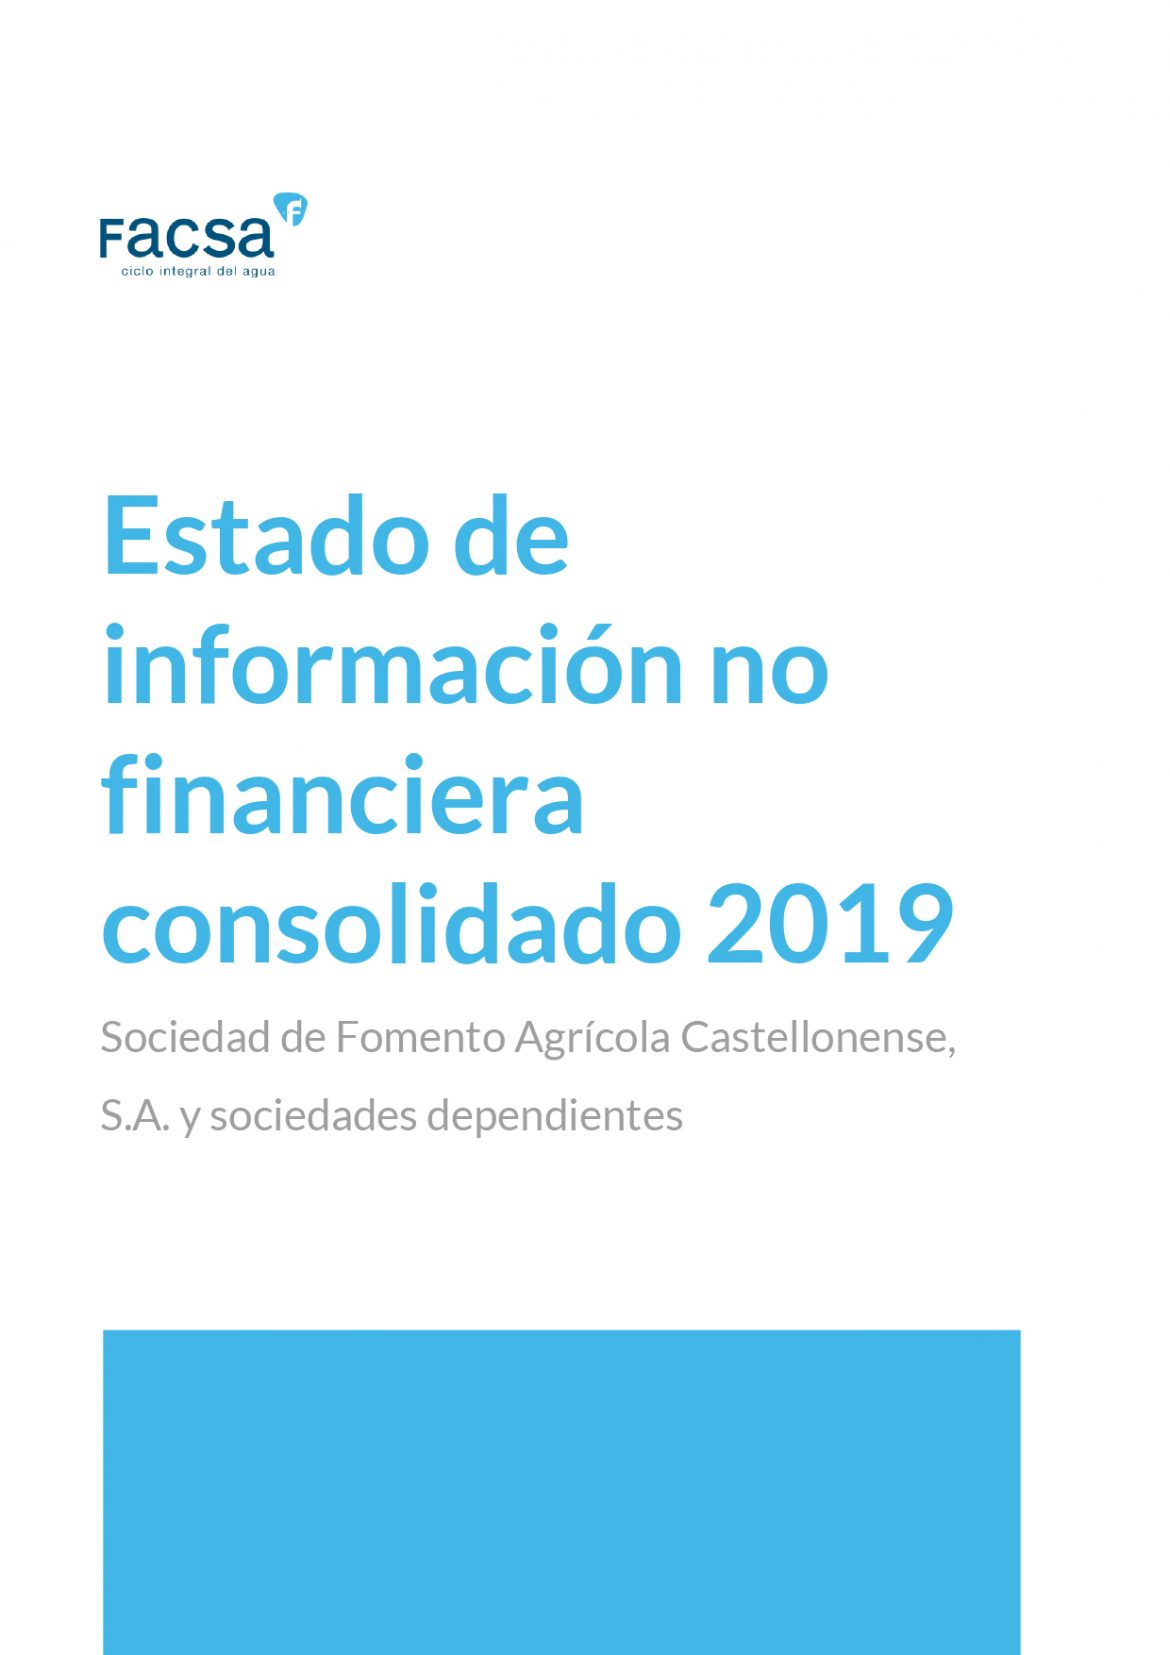 OK_Adaptado_Portada-EINF_2019.jpg